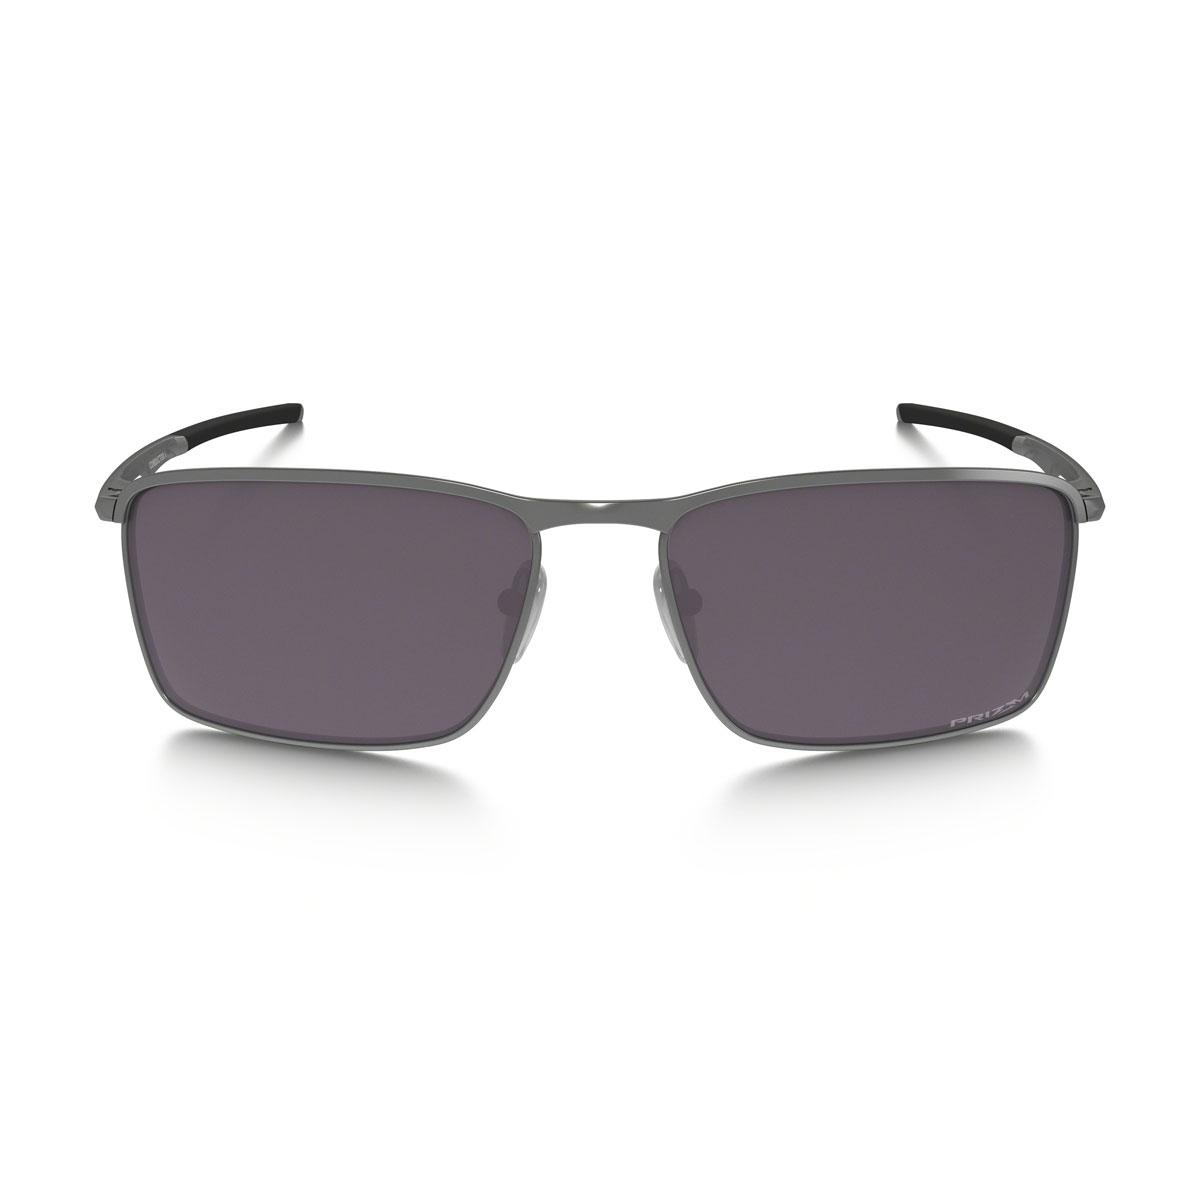 f4c5c231804 ... Image of Oakley Conductor 6 Prizm Daily Polarized Sunglasses - Lead  Frame Prizm Daily Polarized